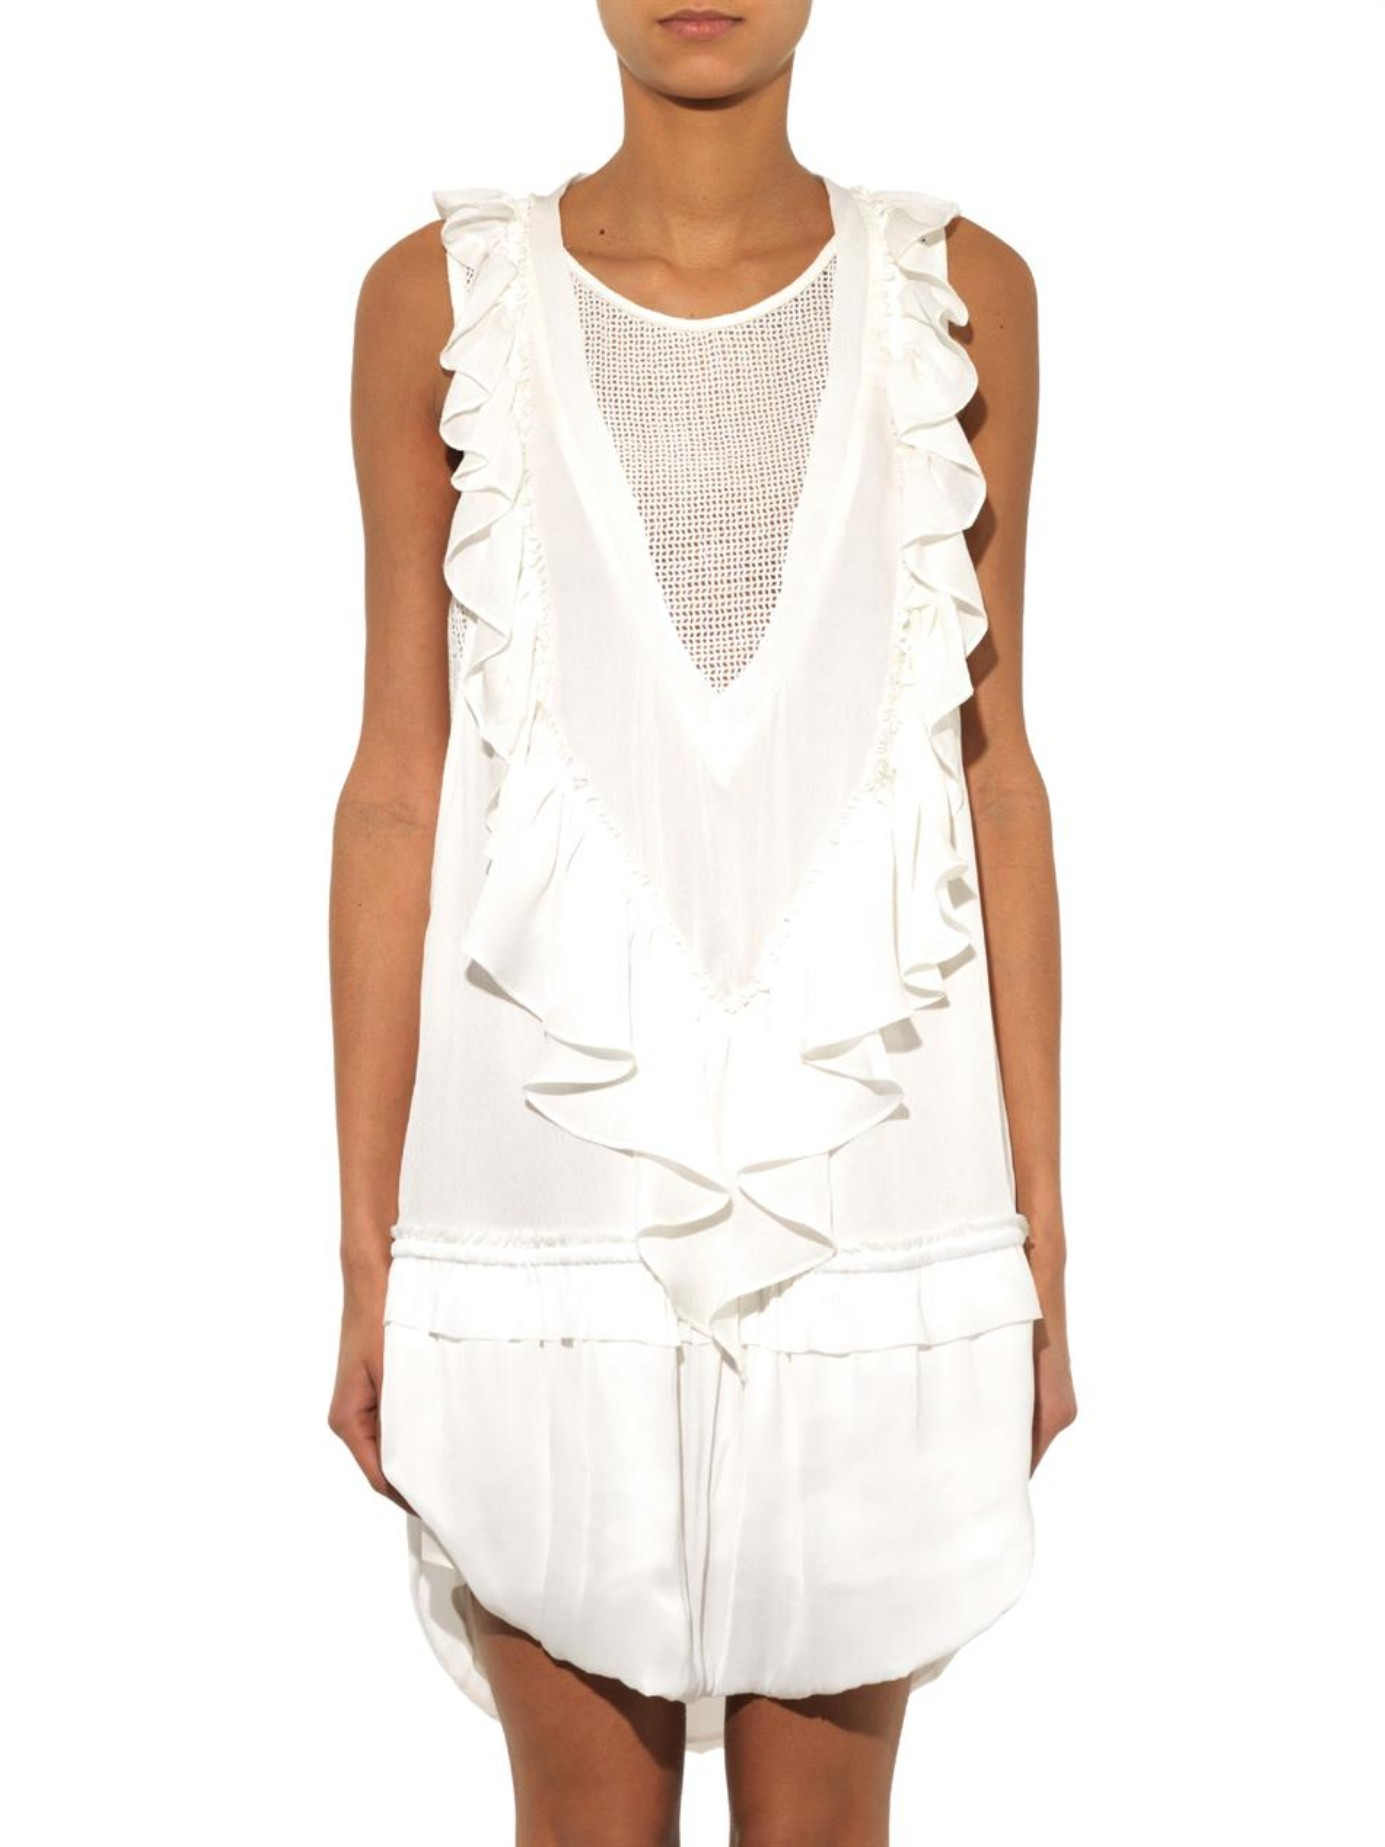 Lyst isabel marant rafael ruffle detail dress in white for Isabel marant shirt dress